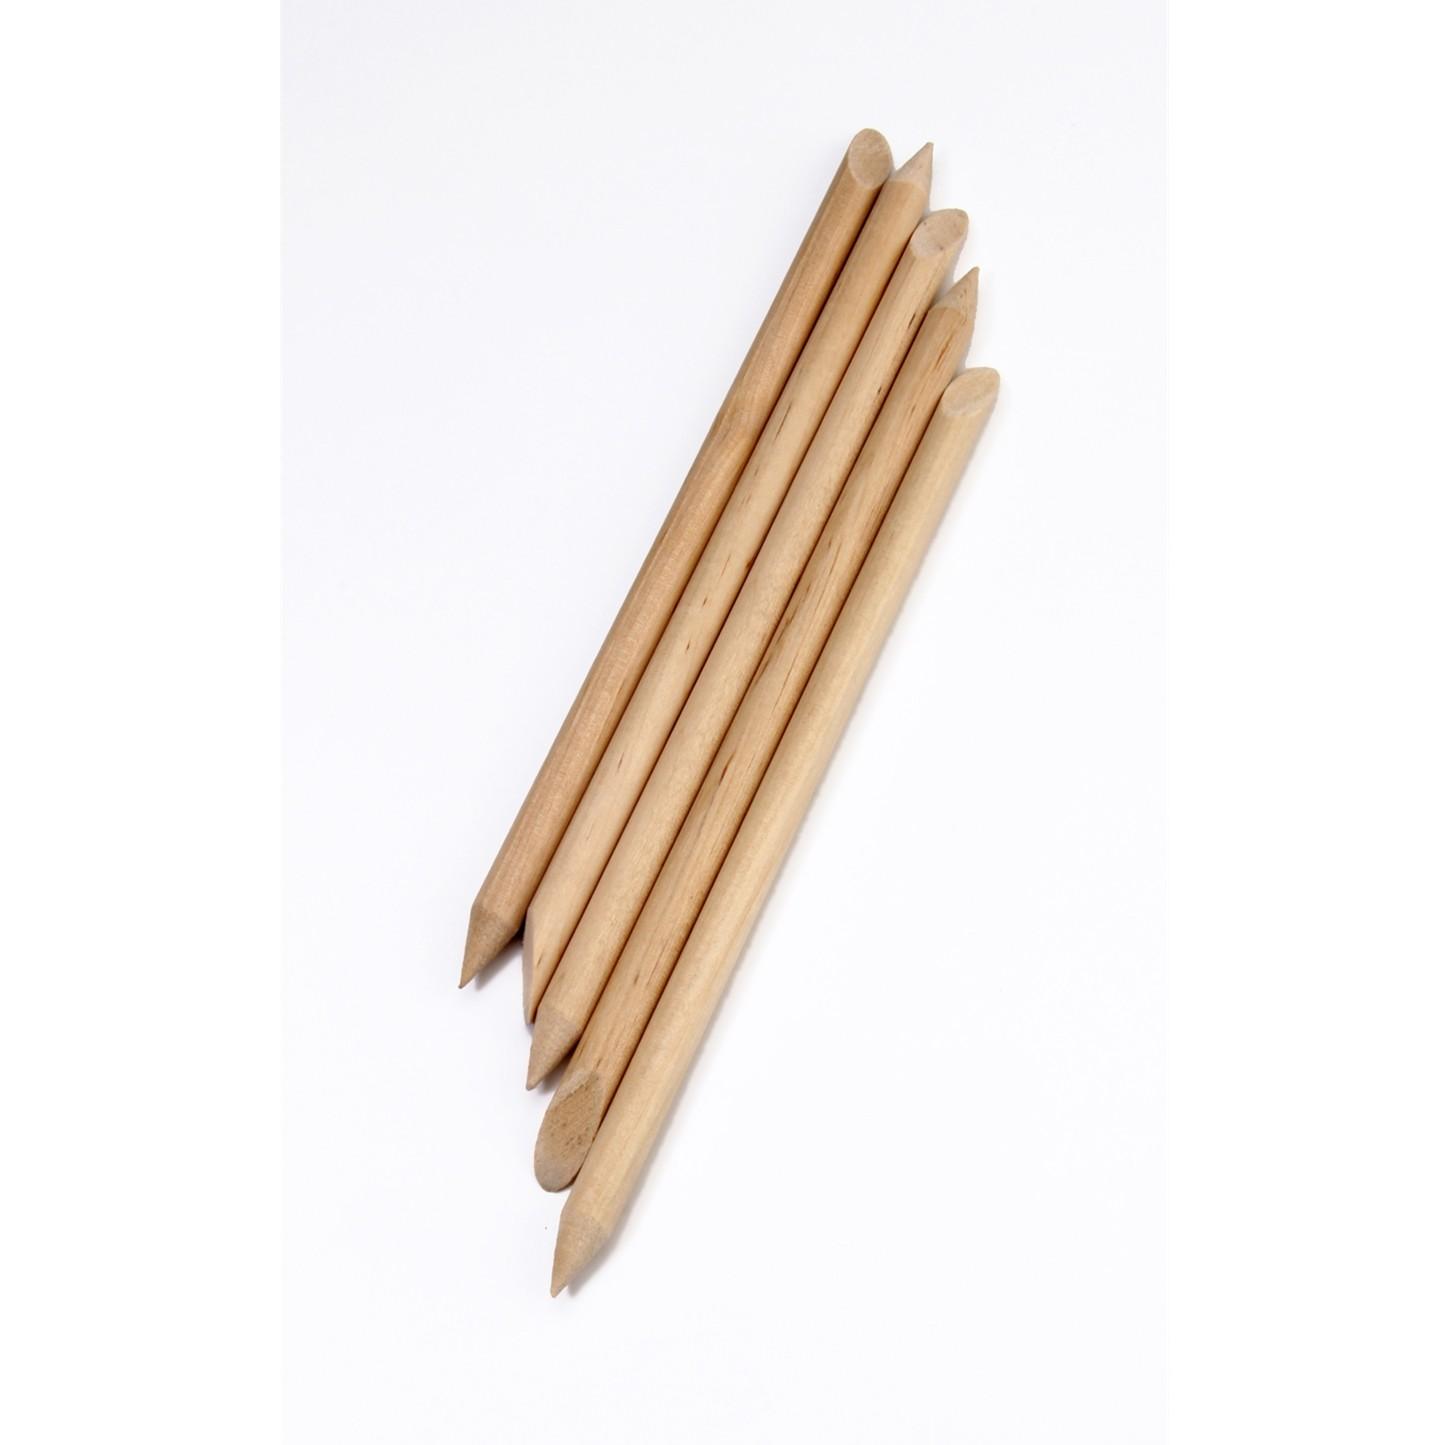 Orangewood Cuticle Sticks (5 pack)